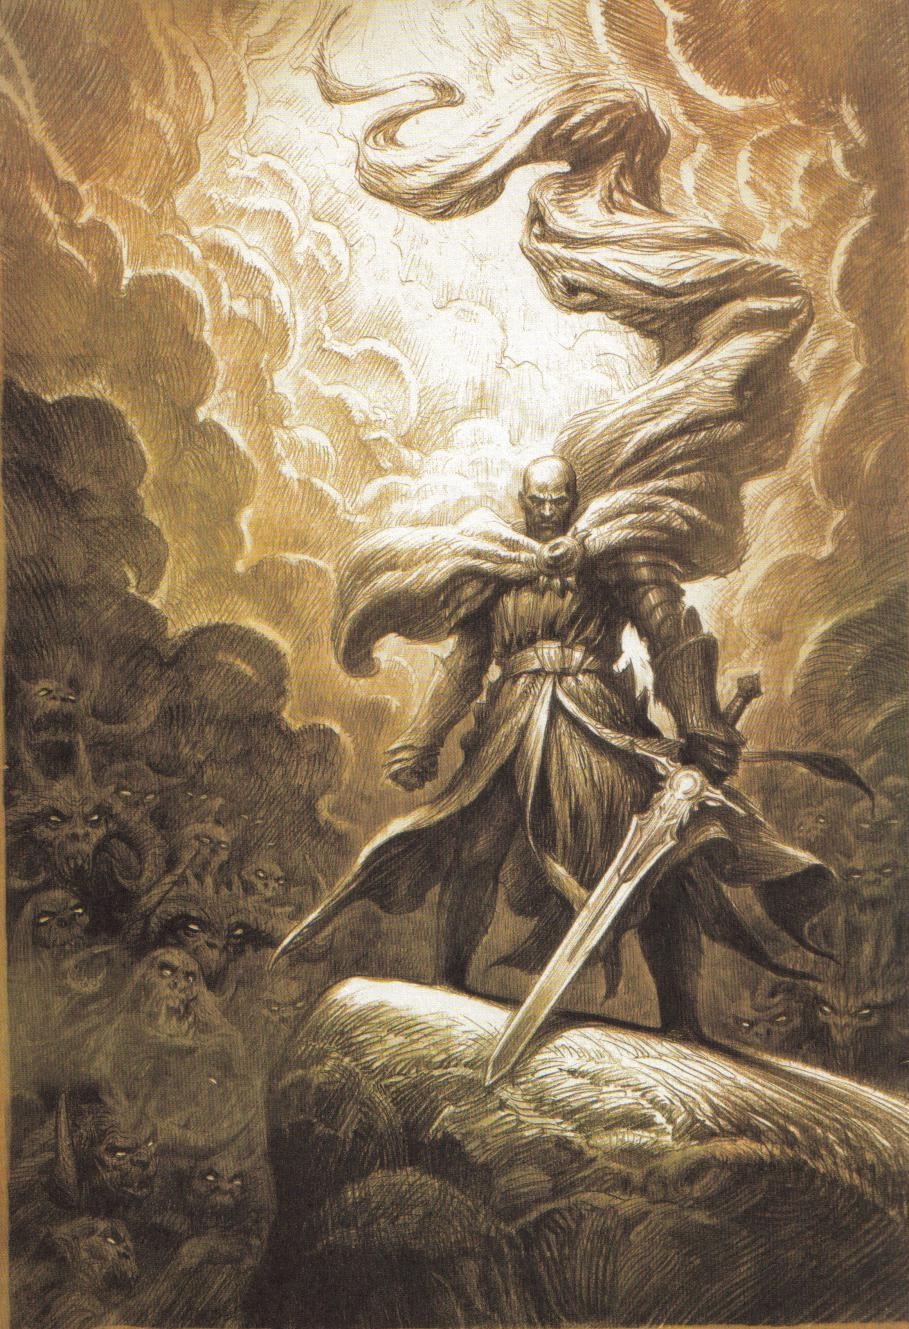 Diablo 3 Book Of Cain Video Game EBook